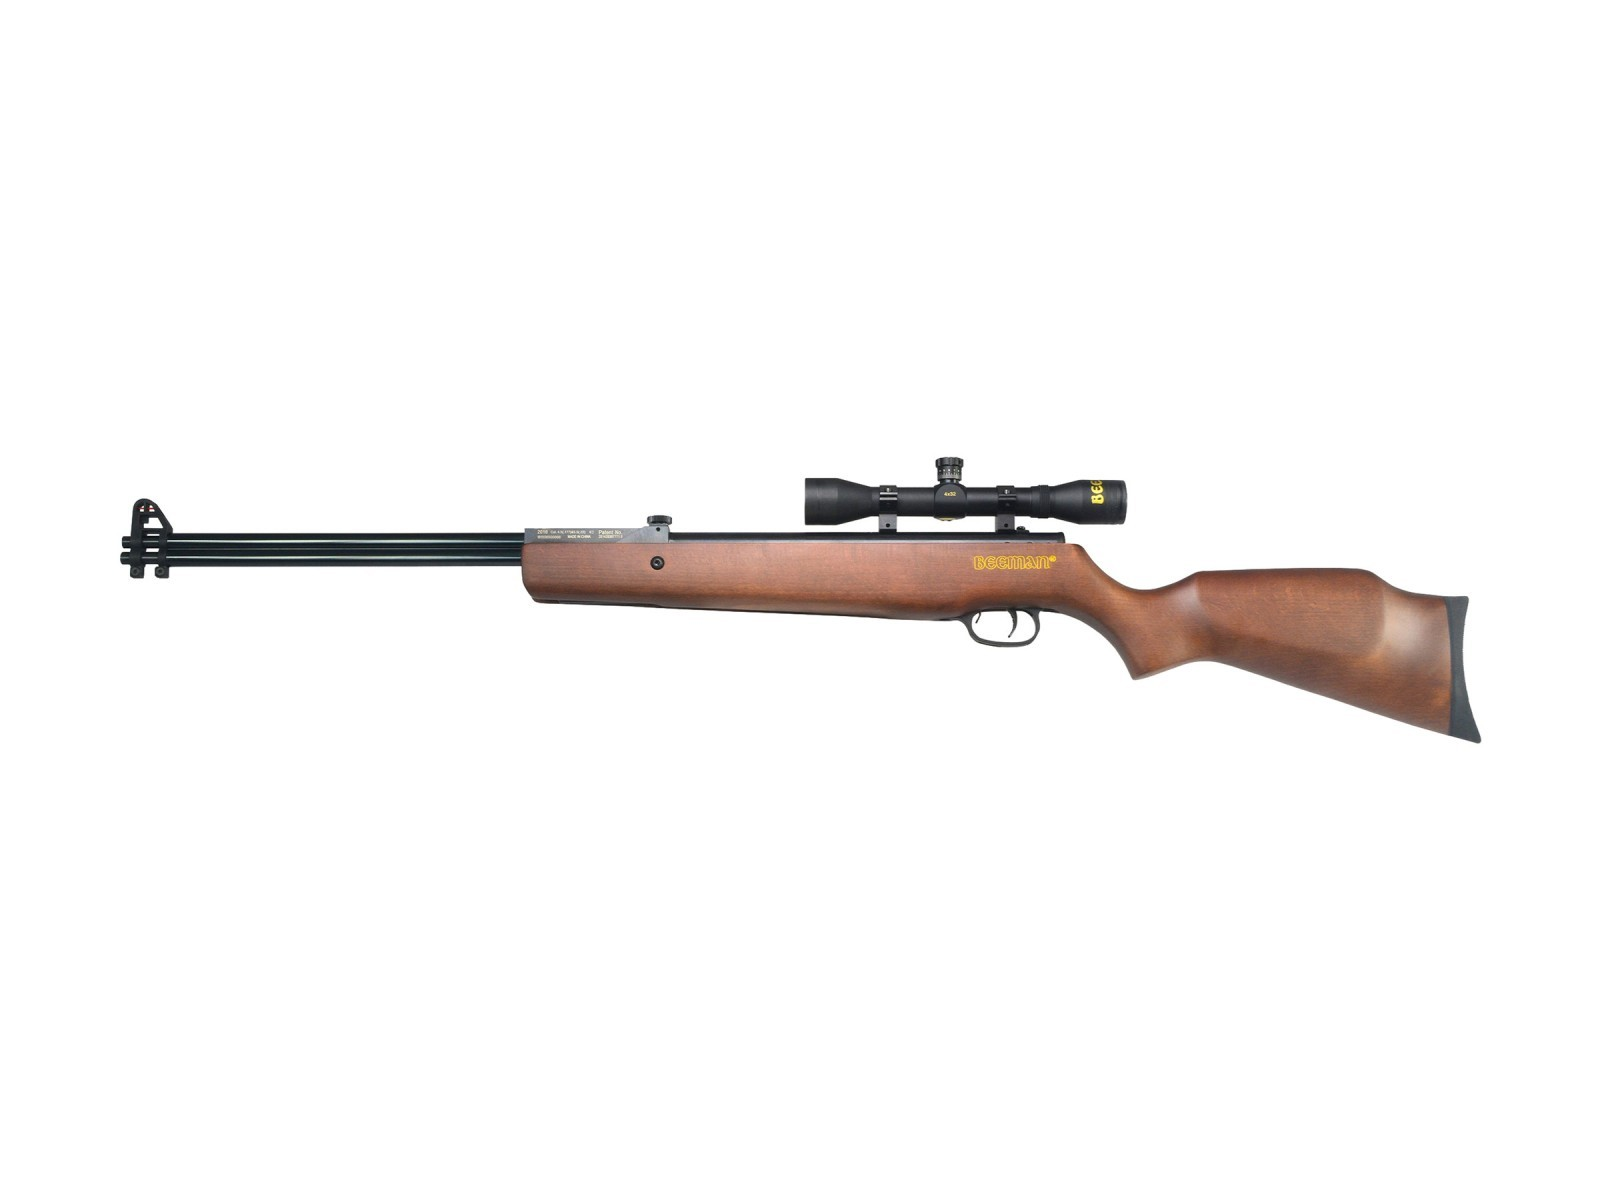 Cheap Beeman Double Barrel, Multi-caliber, Air Rifle 0.177